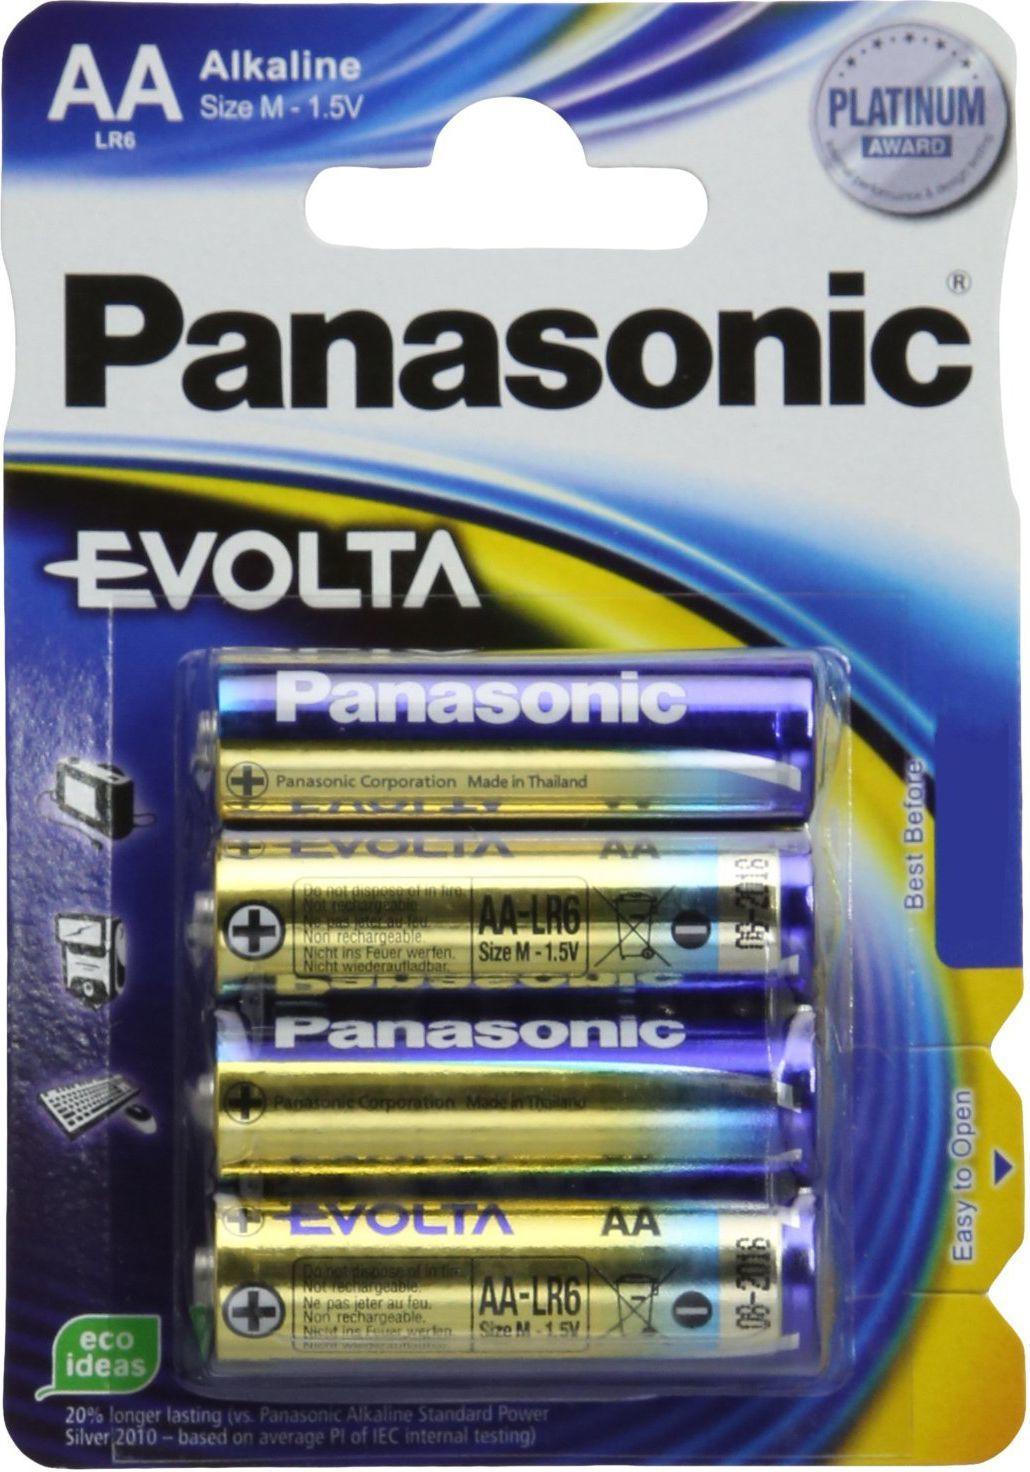 Panasonic Bateria Evolta AA / R6 4szt. 1